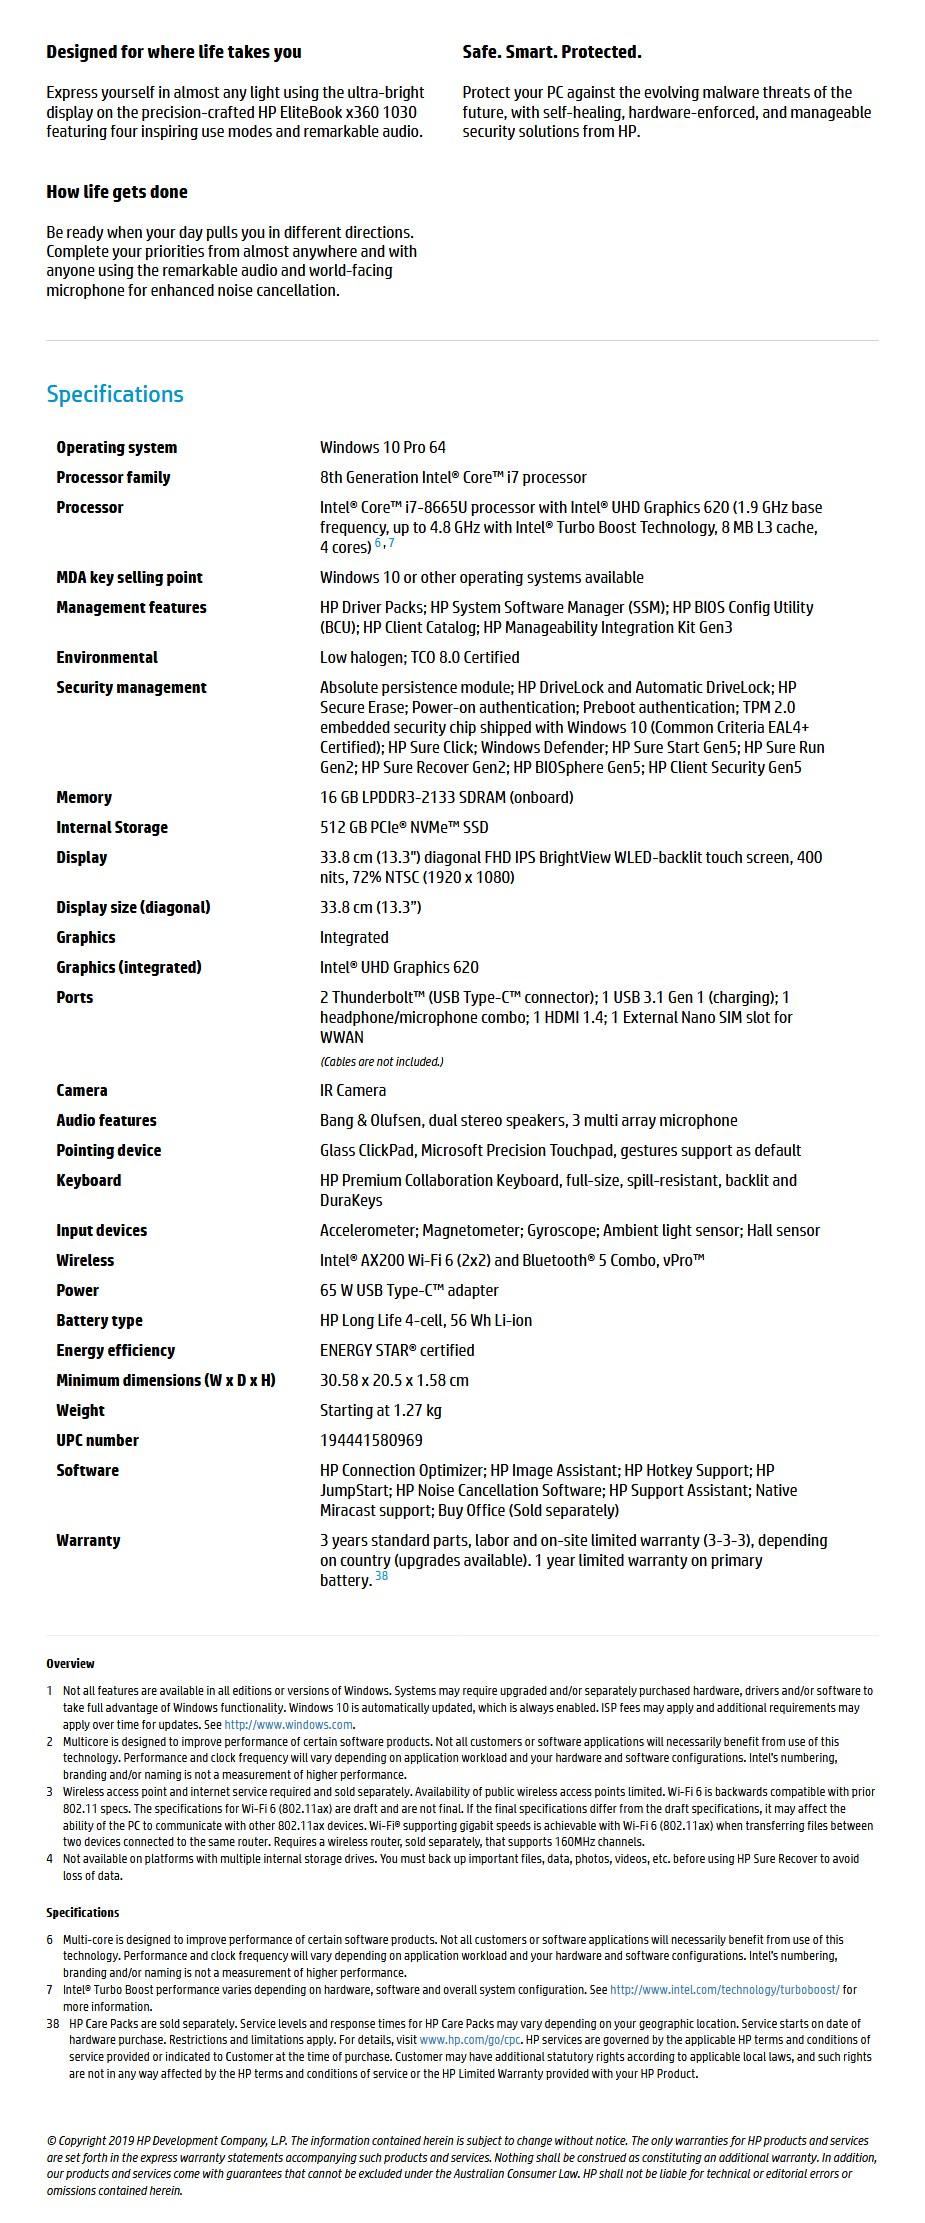 "HP EliteBook x360 1030 G4 13.3"" Laptop i7-8665U 16GB 512GB W10P Touch - Overview 1"